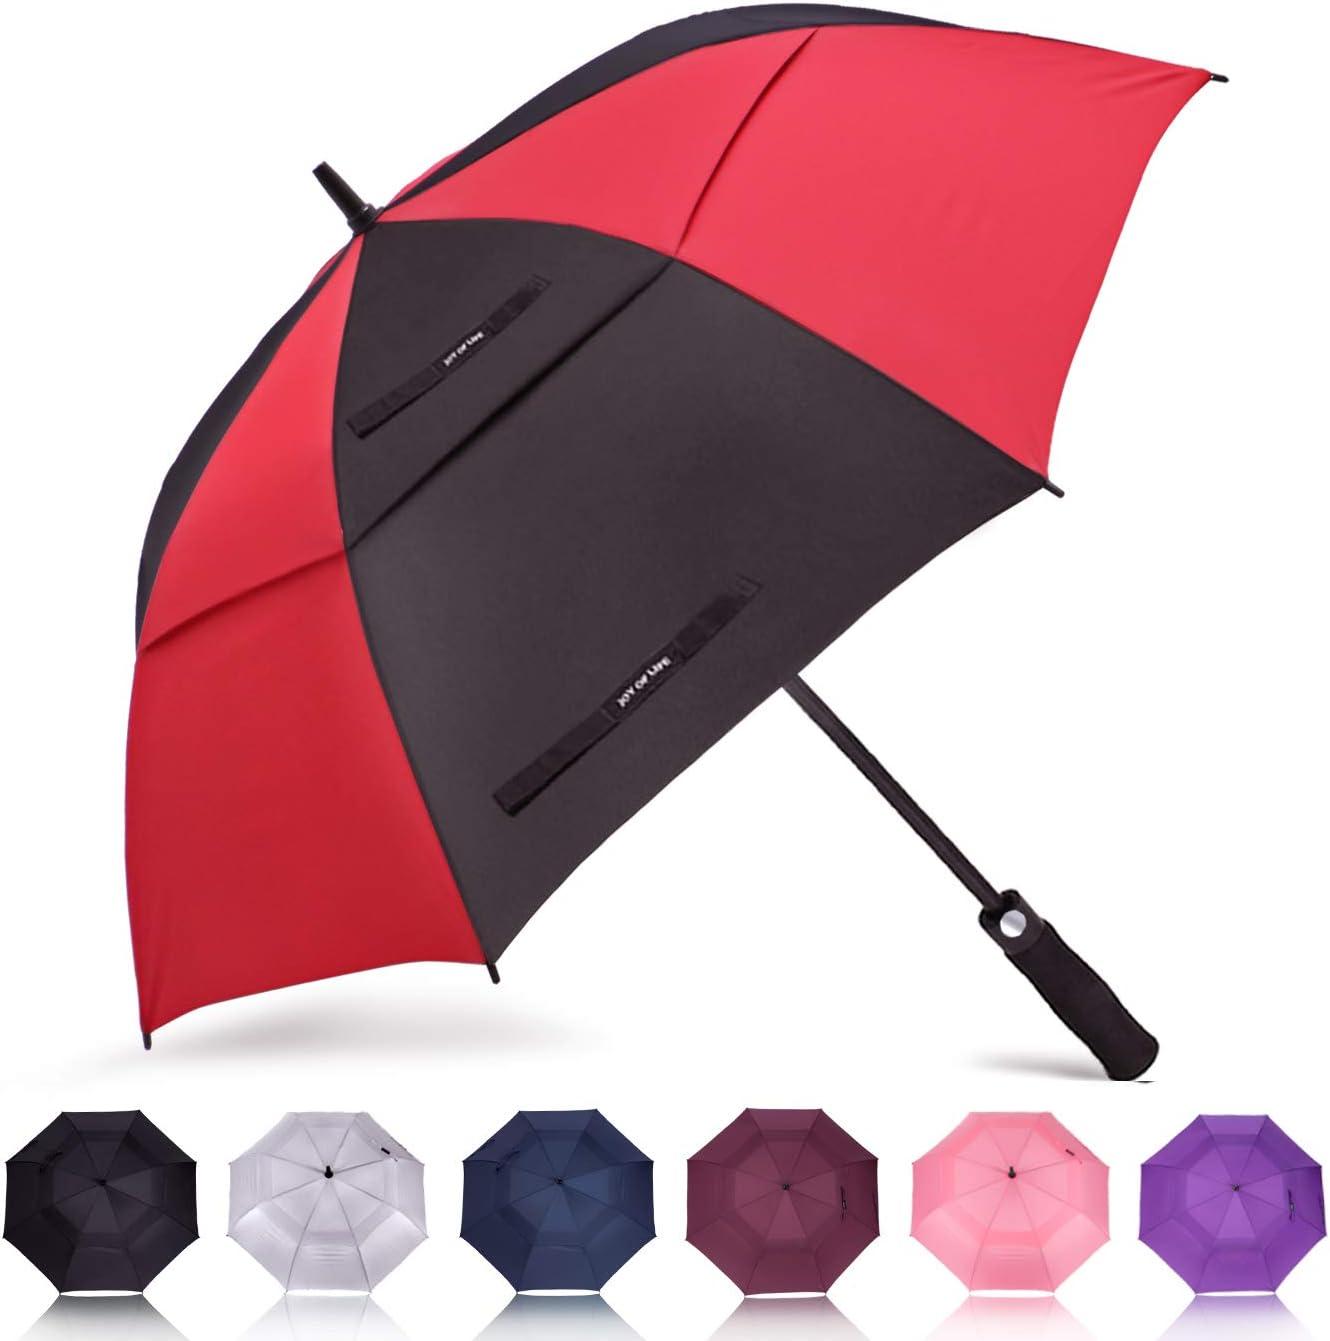 ZOMAKE Golf Umbrella 58/62/68 Inch, Large Windproof Umbrellas Automatic Open Oversize Rain Umbrella with Double Canopy for Men Women - Vented Stick Umbrellas